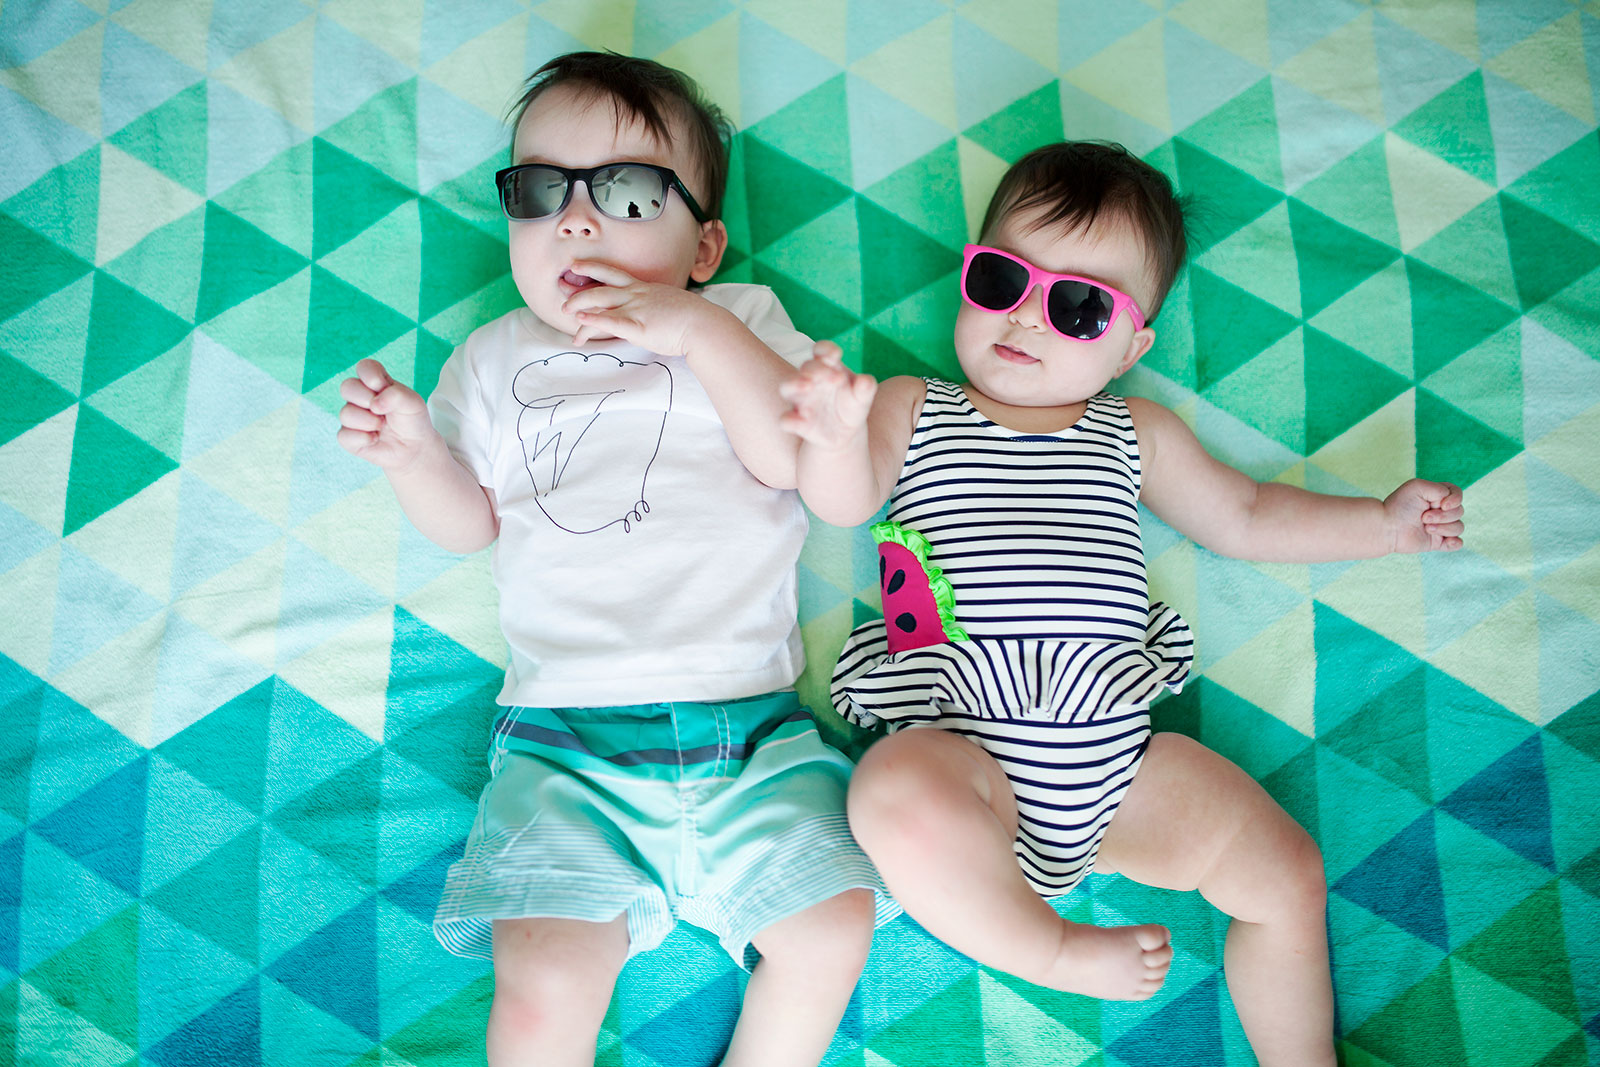 Carter/'s Infants Baby Swimsuit Rashguard Set Long Sleeves Pink//White Pokadot NWT